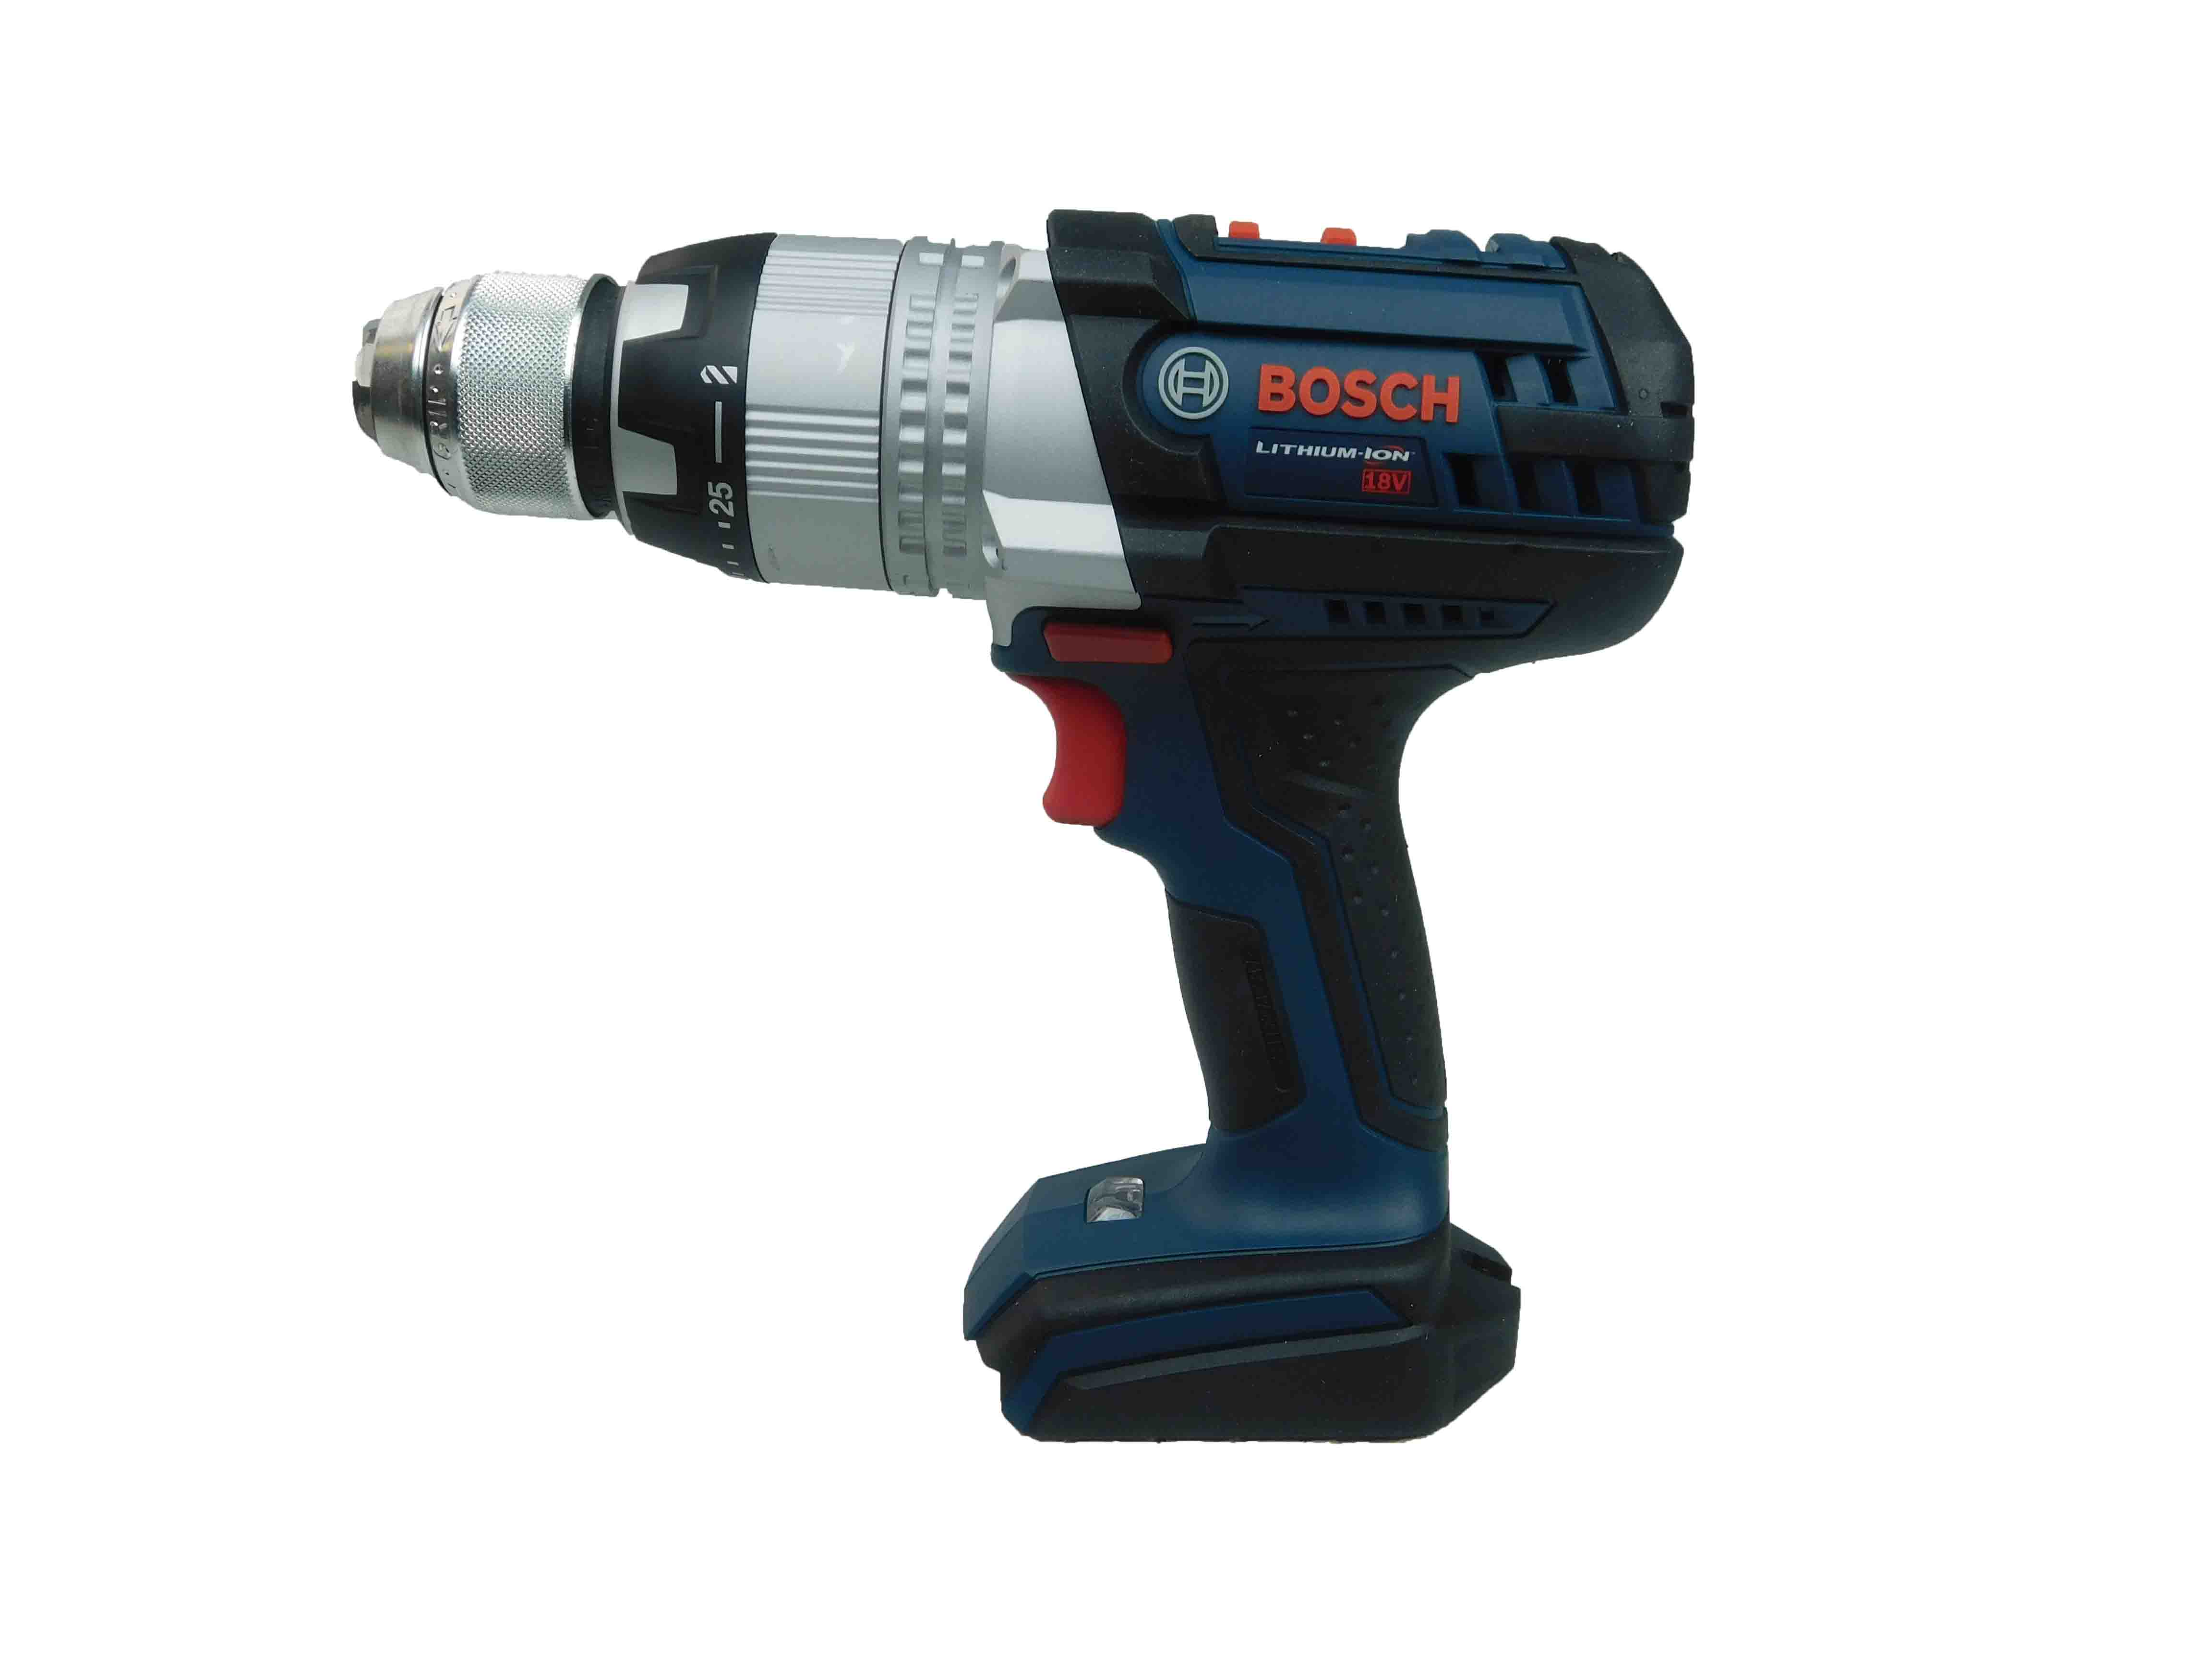 Bosch-HDH181XB18V-Brute-Tough-1-2-In.-Hammer-Drill-Driver-image-11